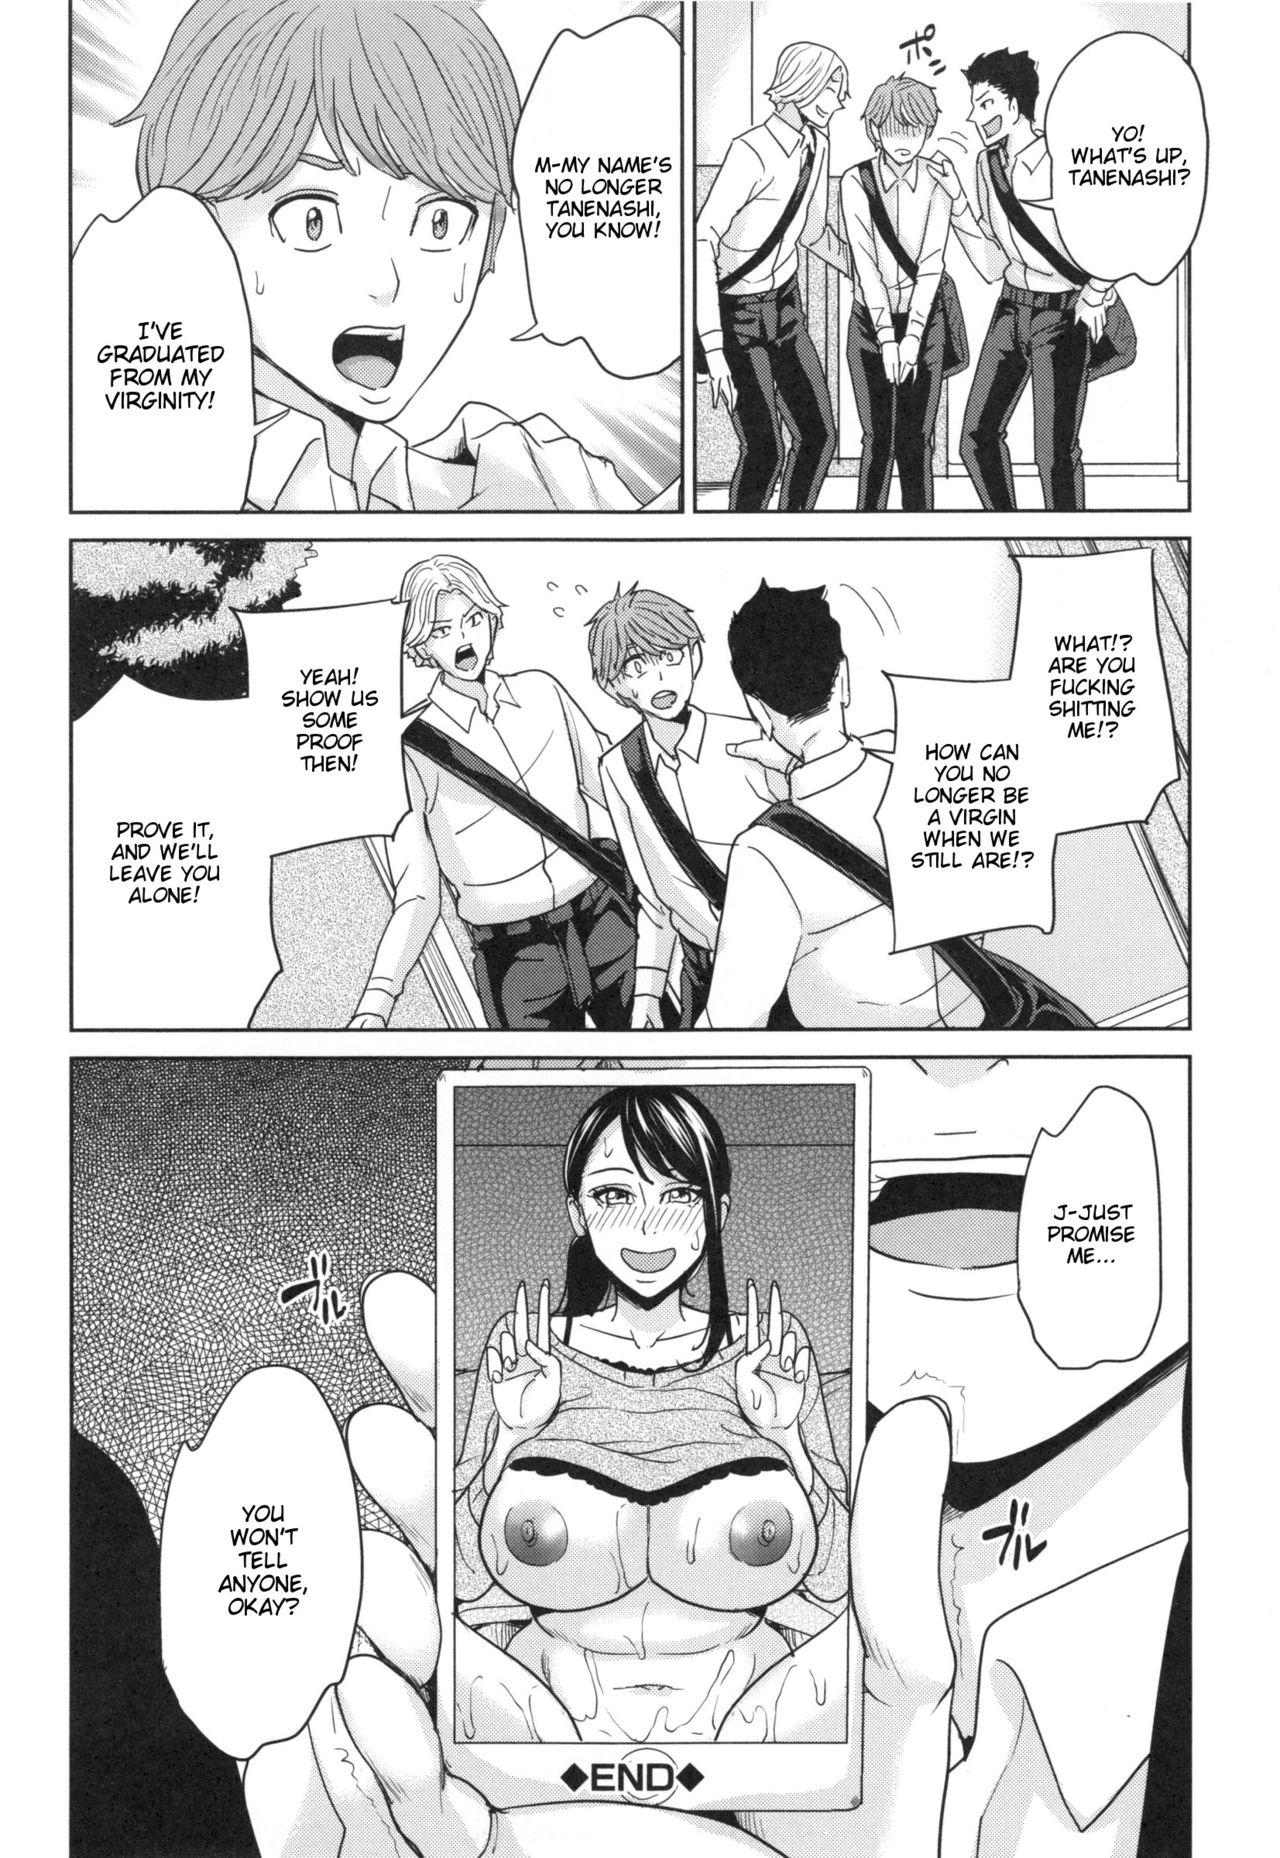 [Maimu-Maimu] Aniyome Bitch Life | Sister-in-Law Slut Life [English] {Taihen Zombii} 124